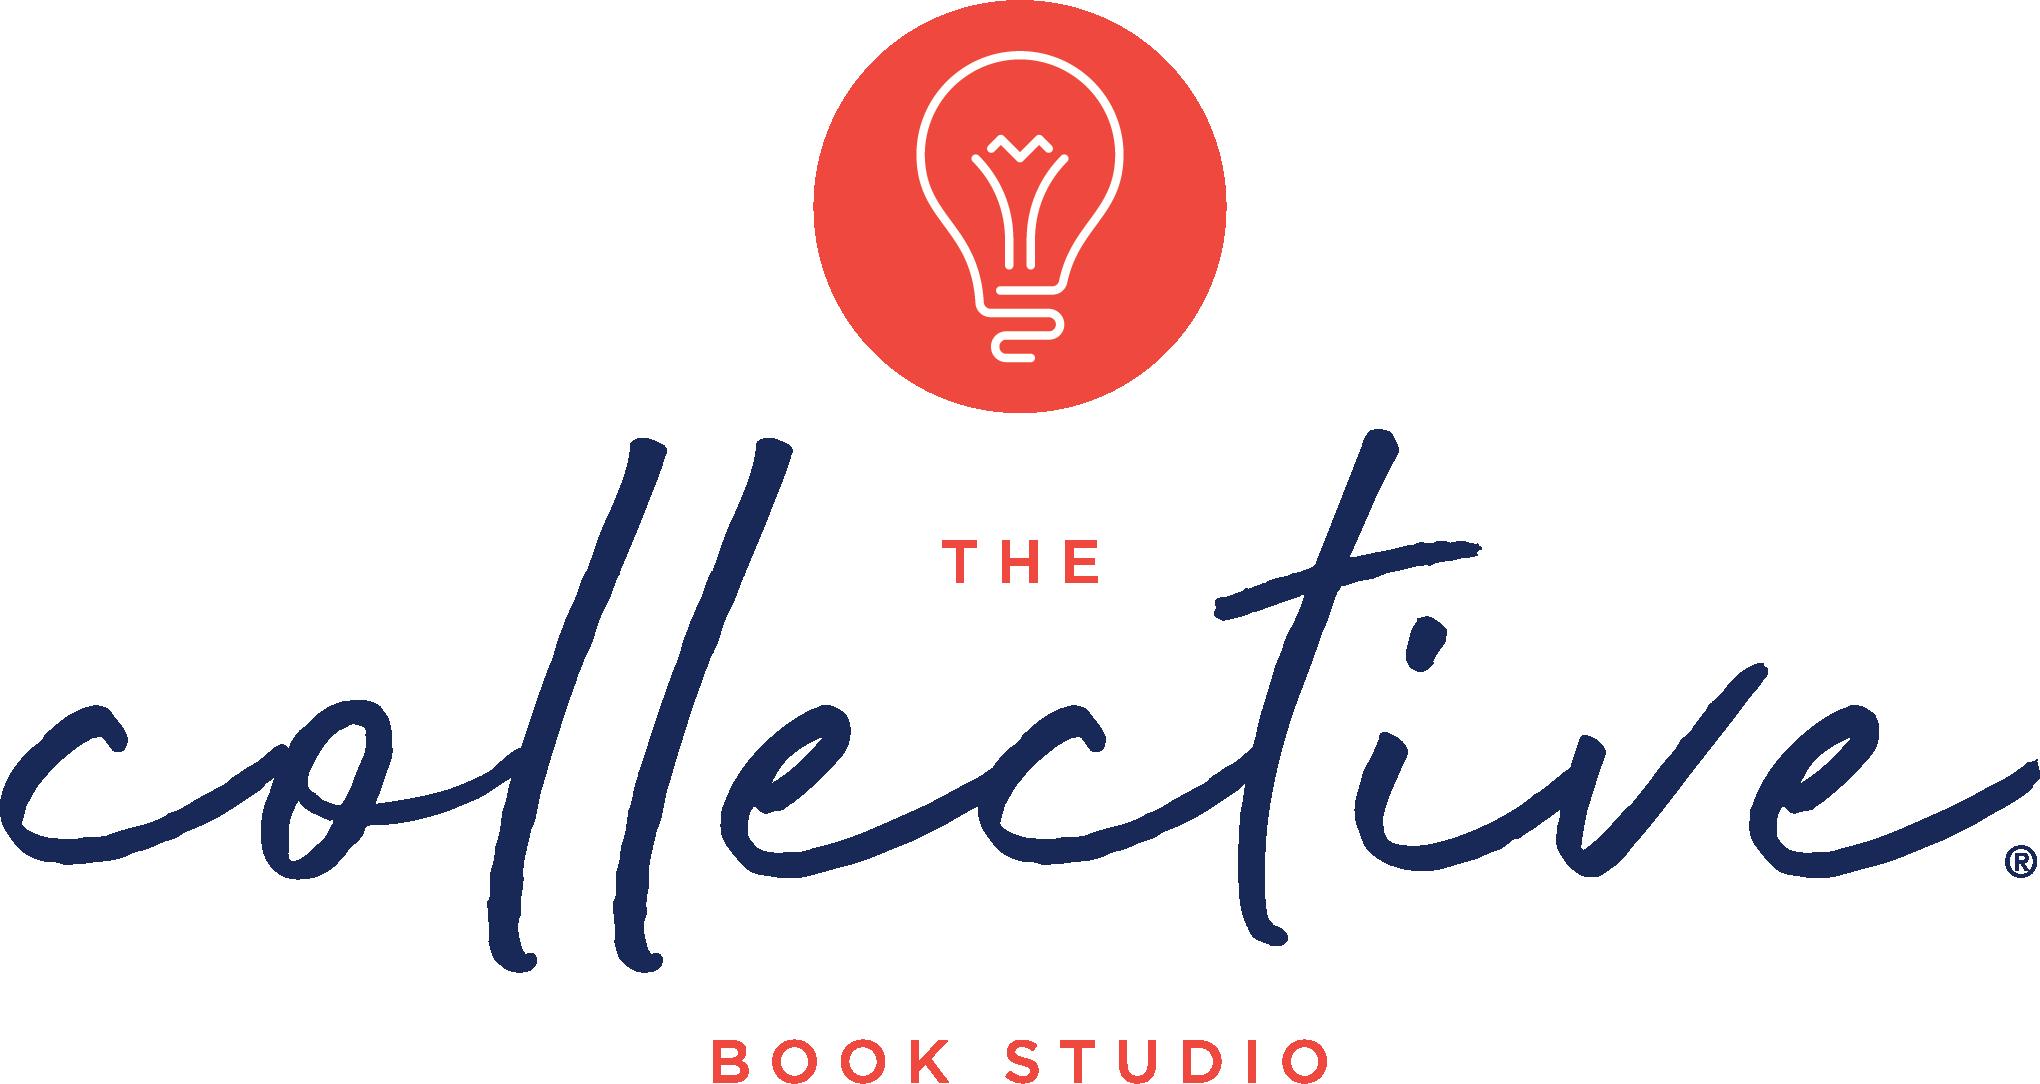 The Collective Book Studio